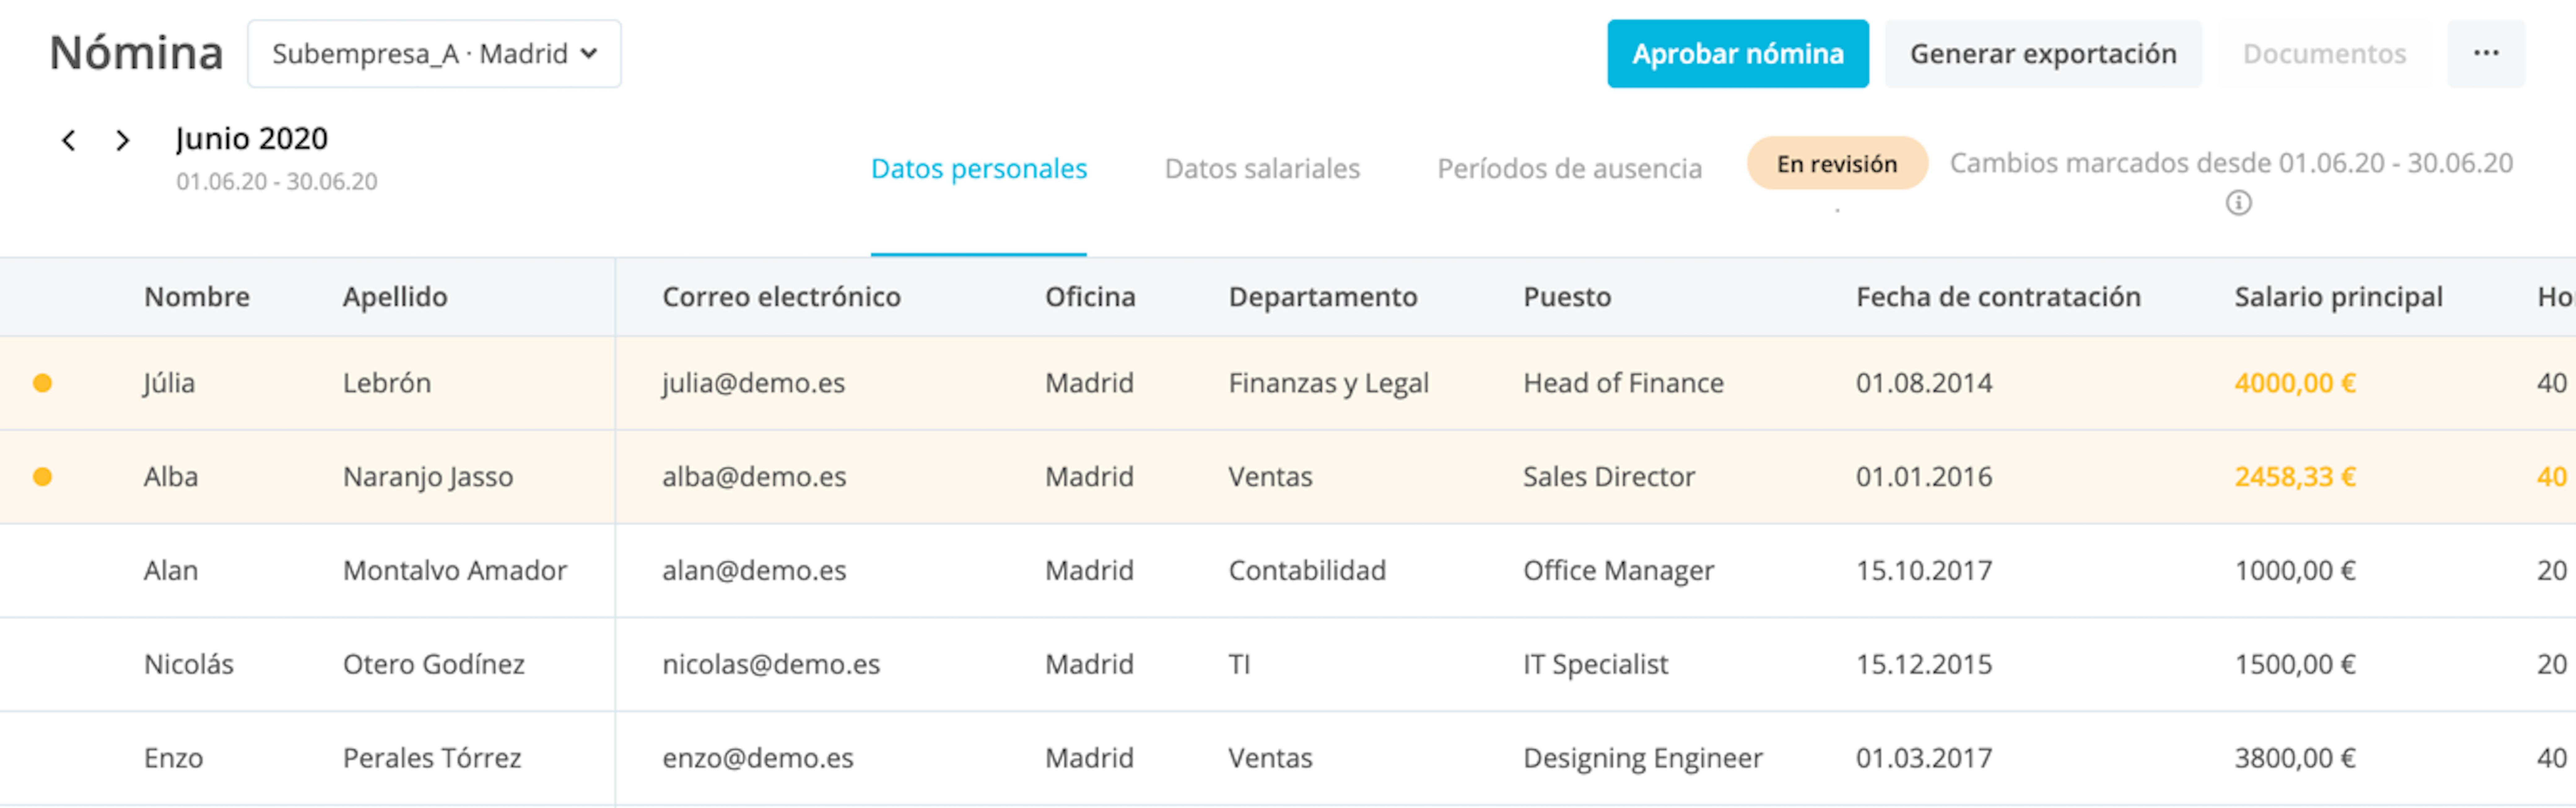 Payroll_Personneldata_Employee_es.png